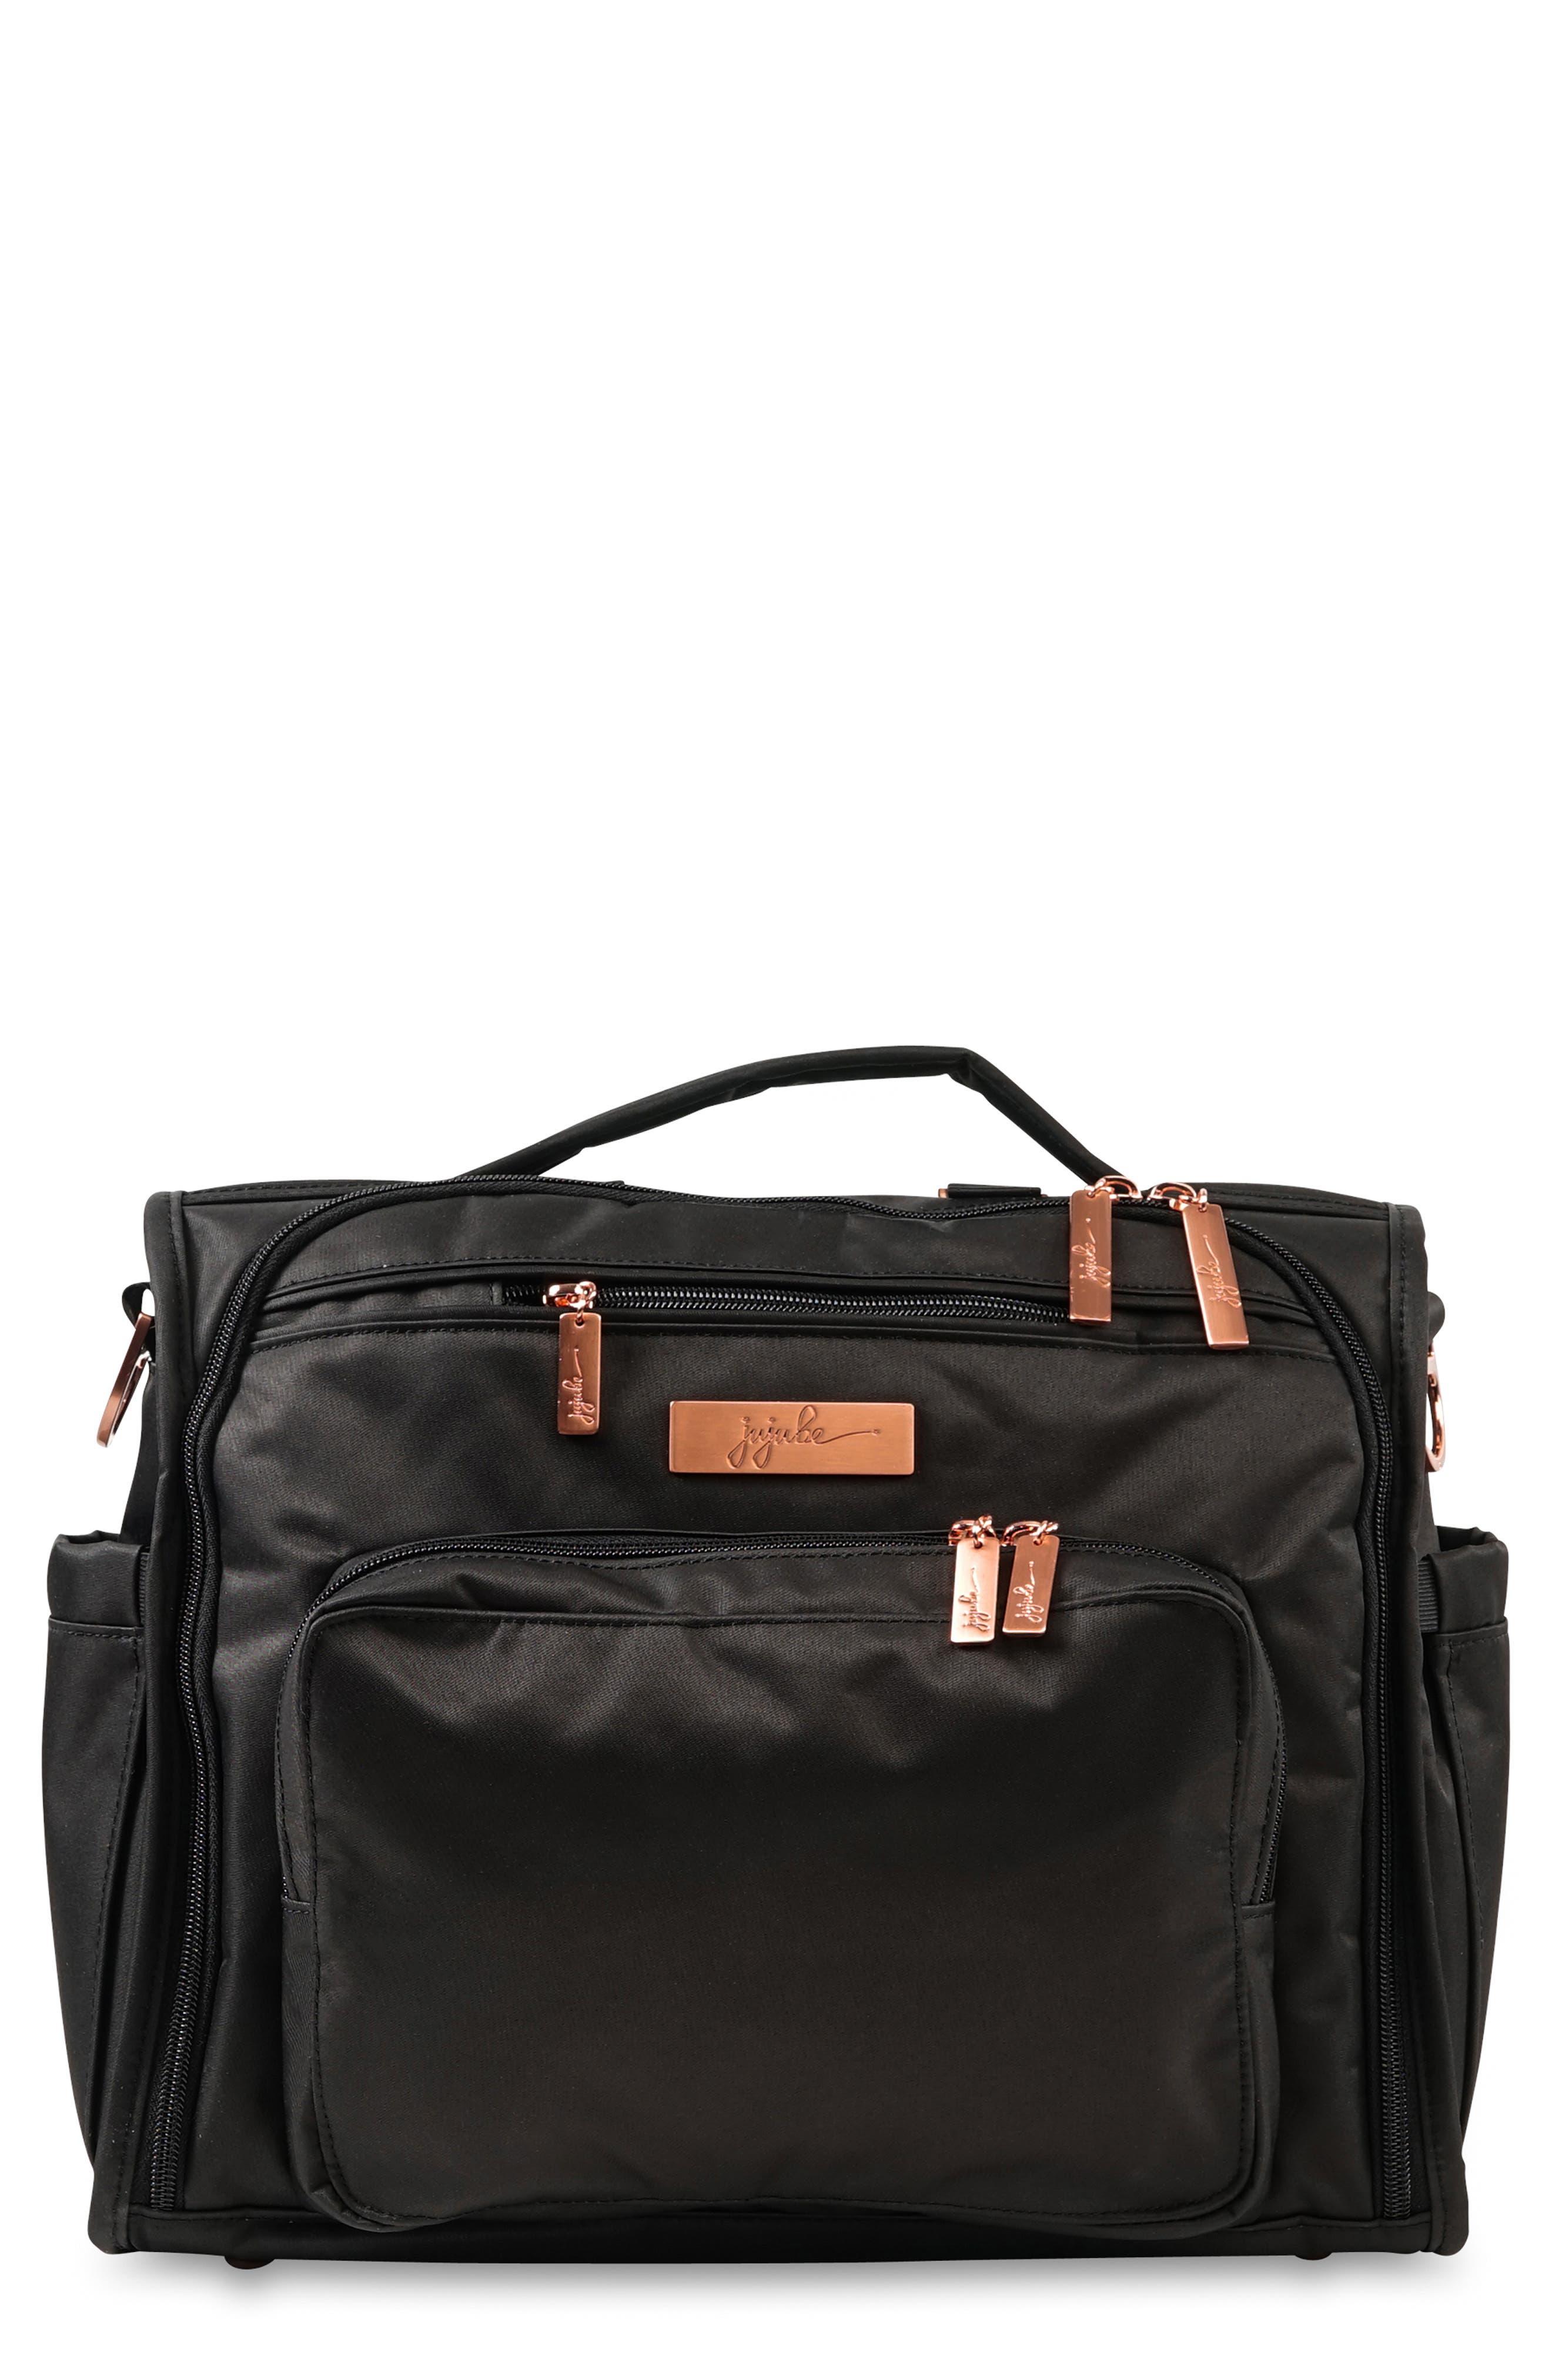 BFF Diaper Bag,                         Main,                         color, KNIGHT ROSE